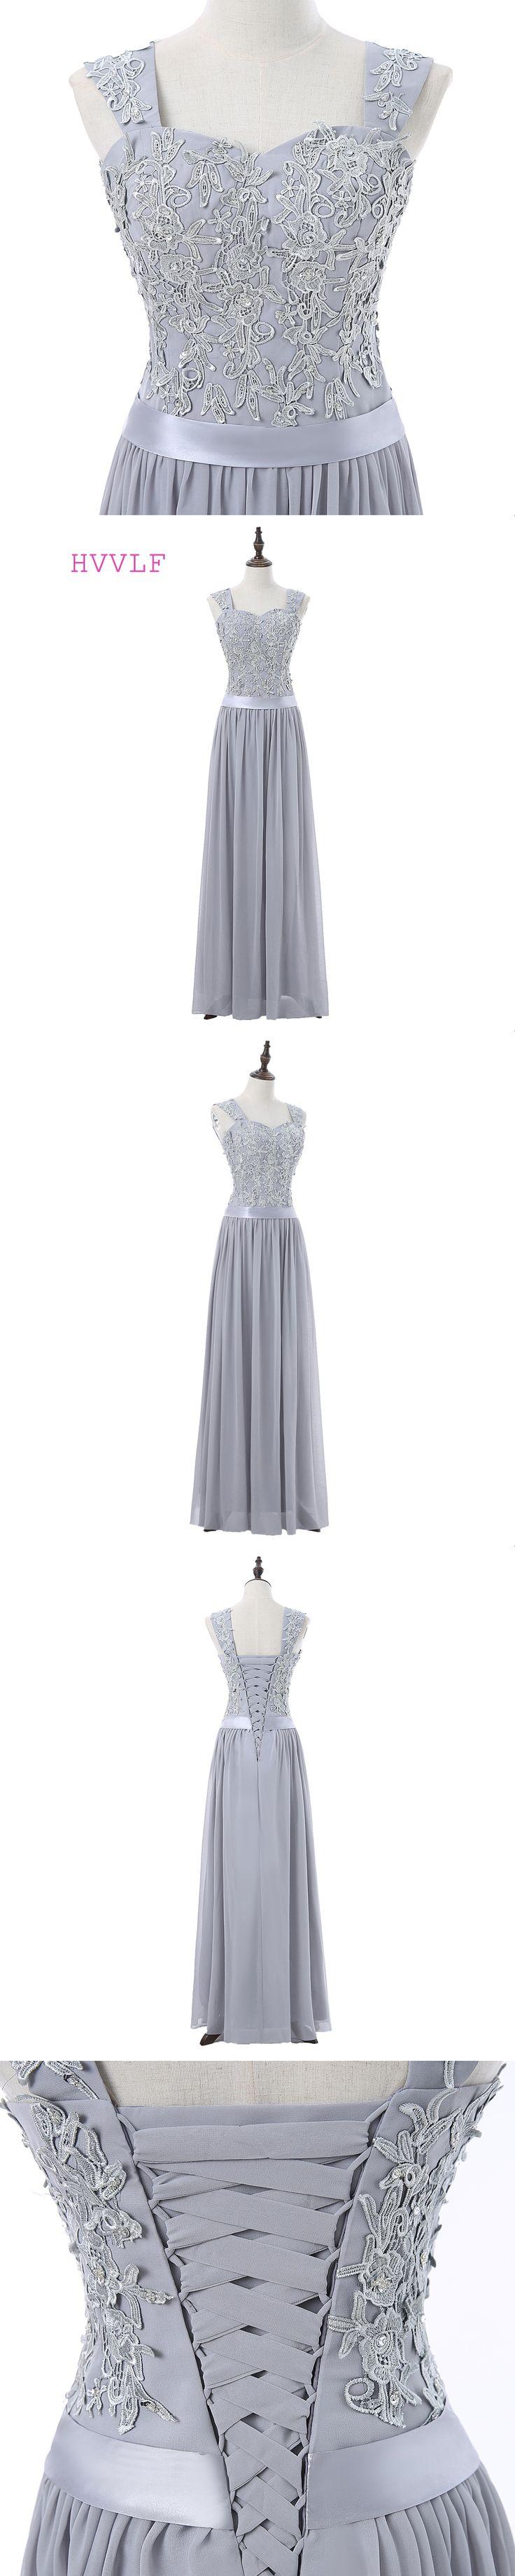 Silver Evening Dresses 2018 A-line Sweetheart Floor Length Chiffon Lace Beaded Robe De Soiree Women Long Evening Gown Prom Dress